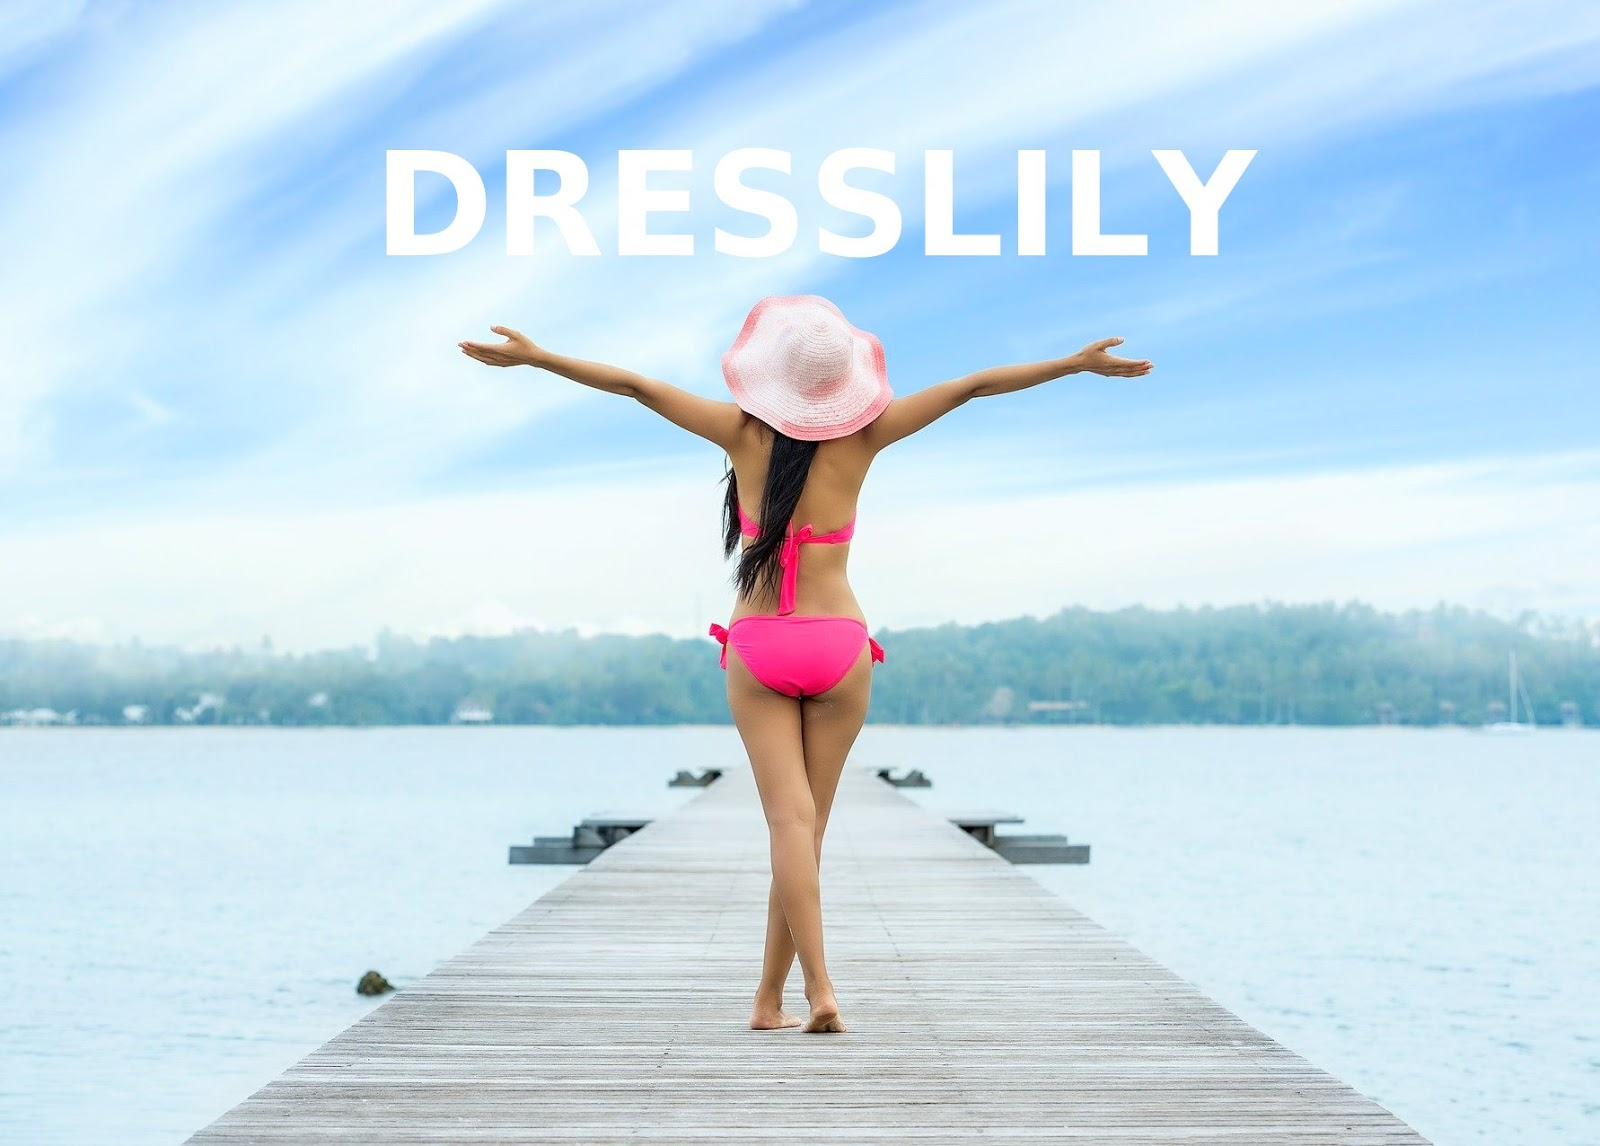 BLOG TESTERSKI: Beach fashion from Dresslily.